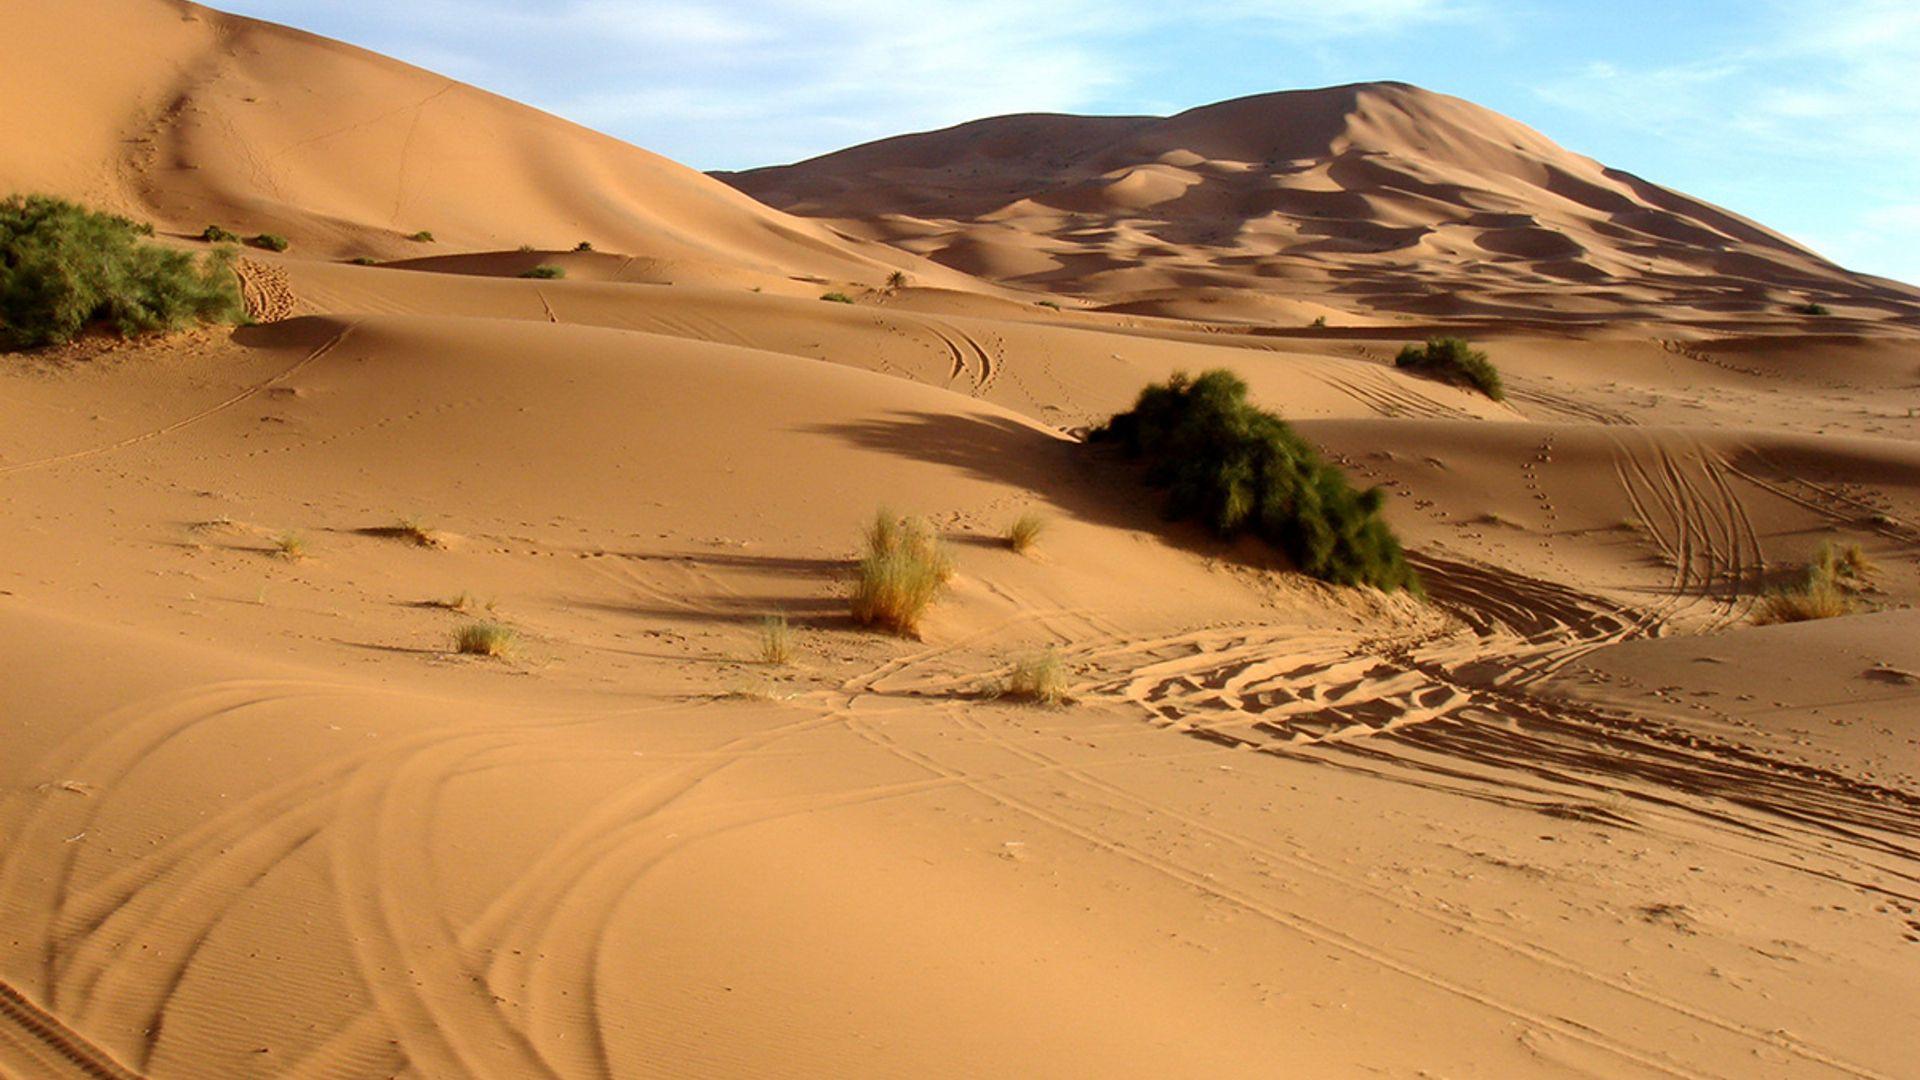 Paste 2022 - Circuit de grup charter - Essential Maroc, 8 zile